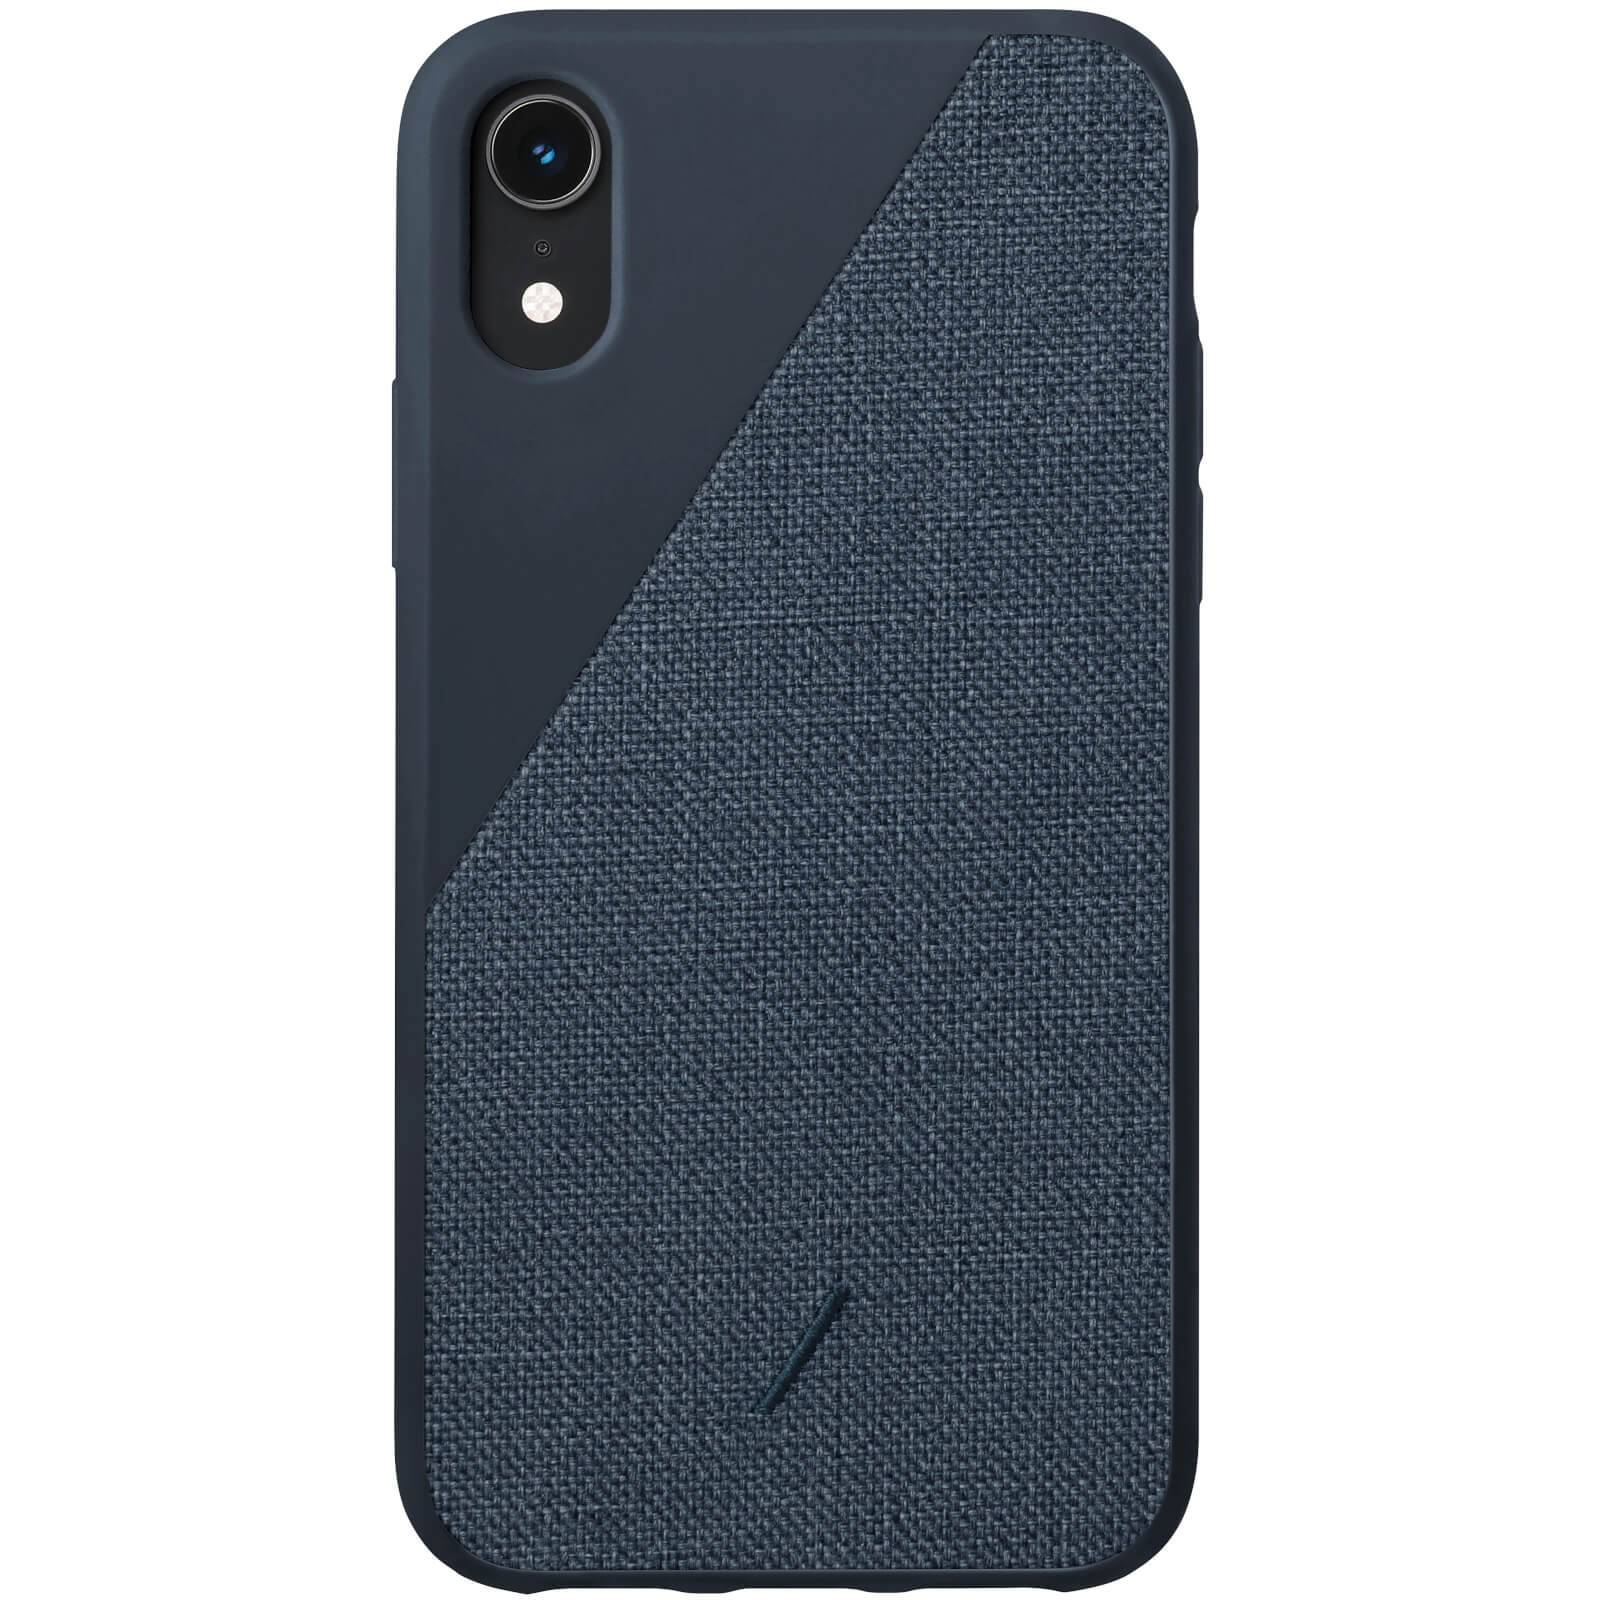 Native Union Clic Canvas iPhone XR Case - Navy